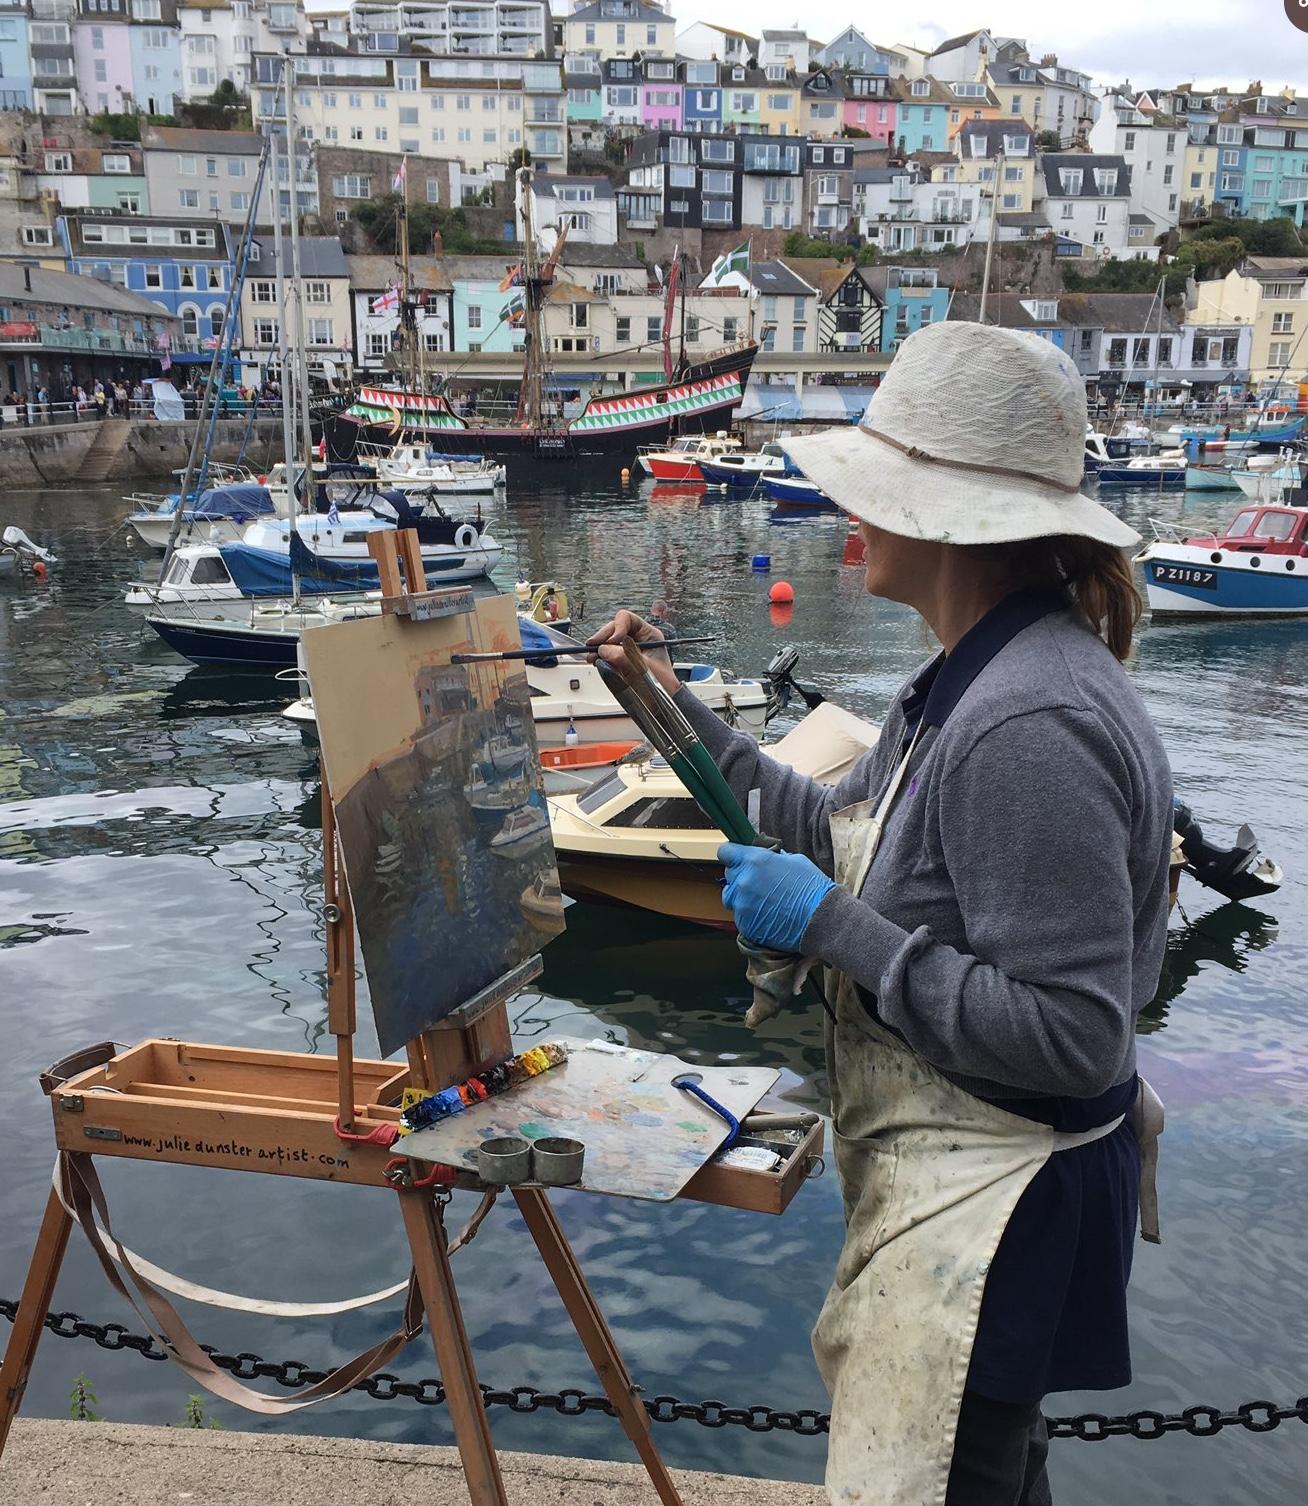 Julie Dunster Open Art Comp